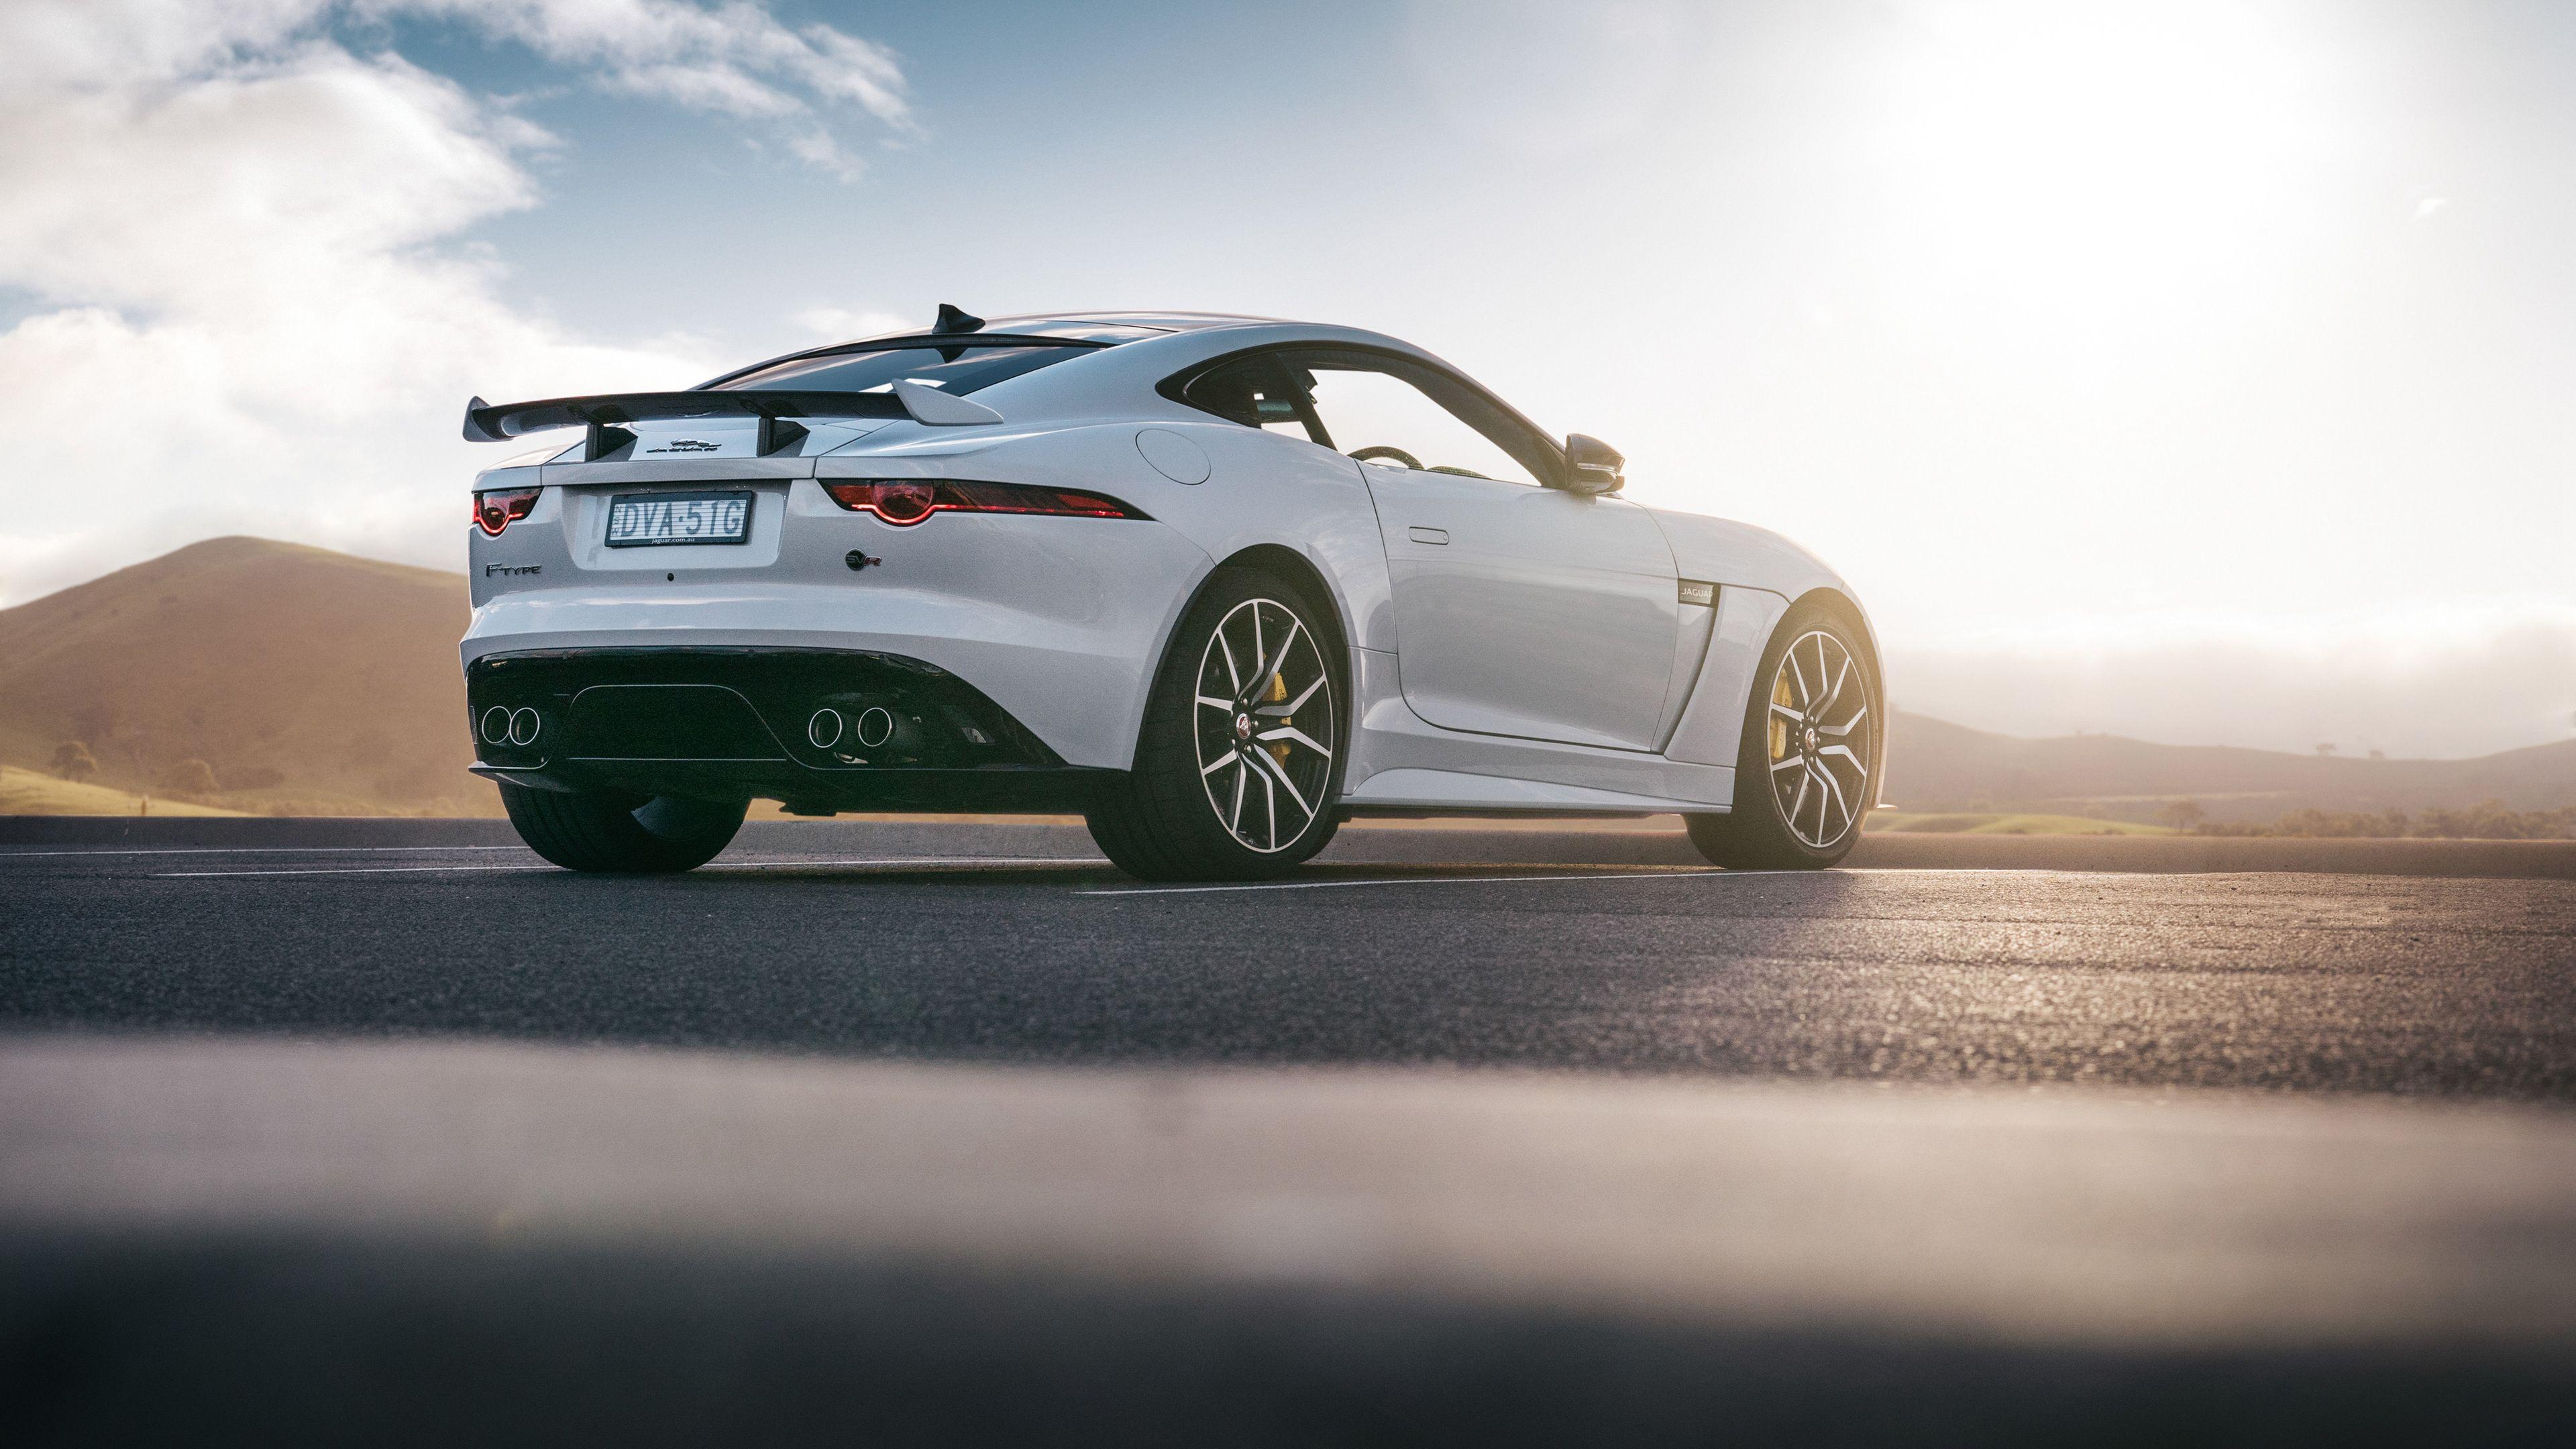 Wallpaper 4k Jaguar F Type Svr Coupe 2018 Rear 4k 2018 Cars